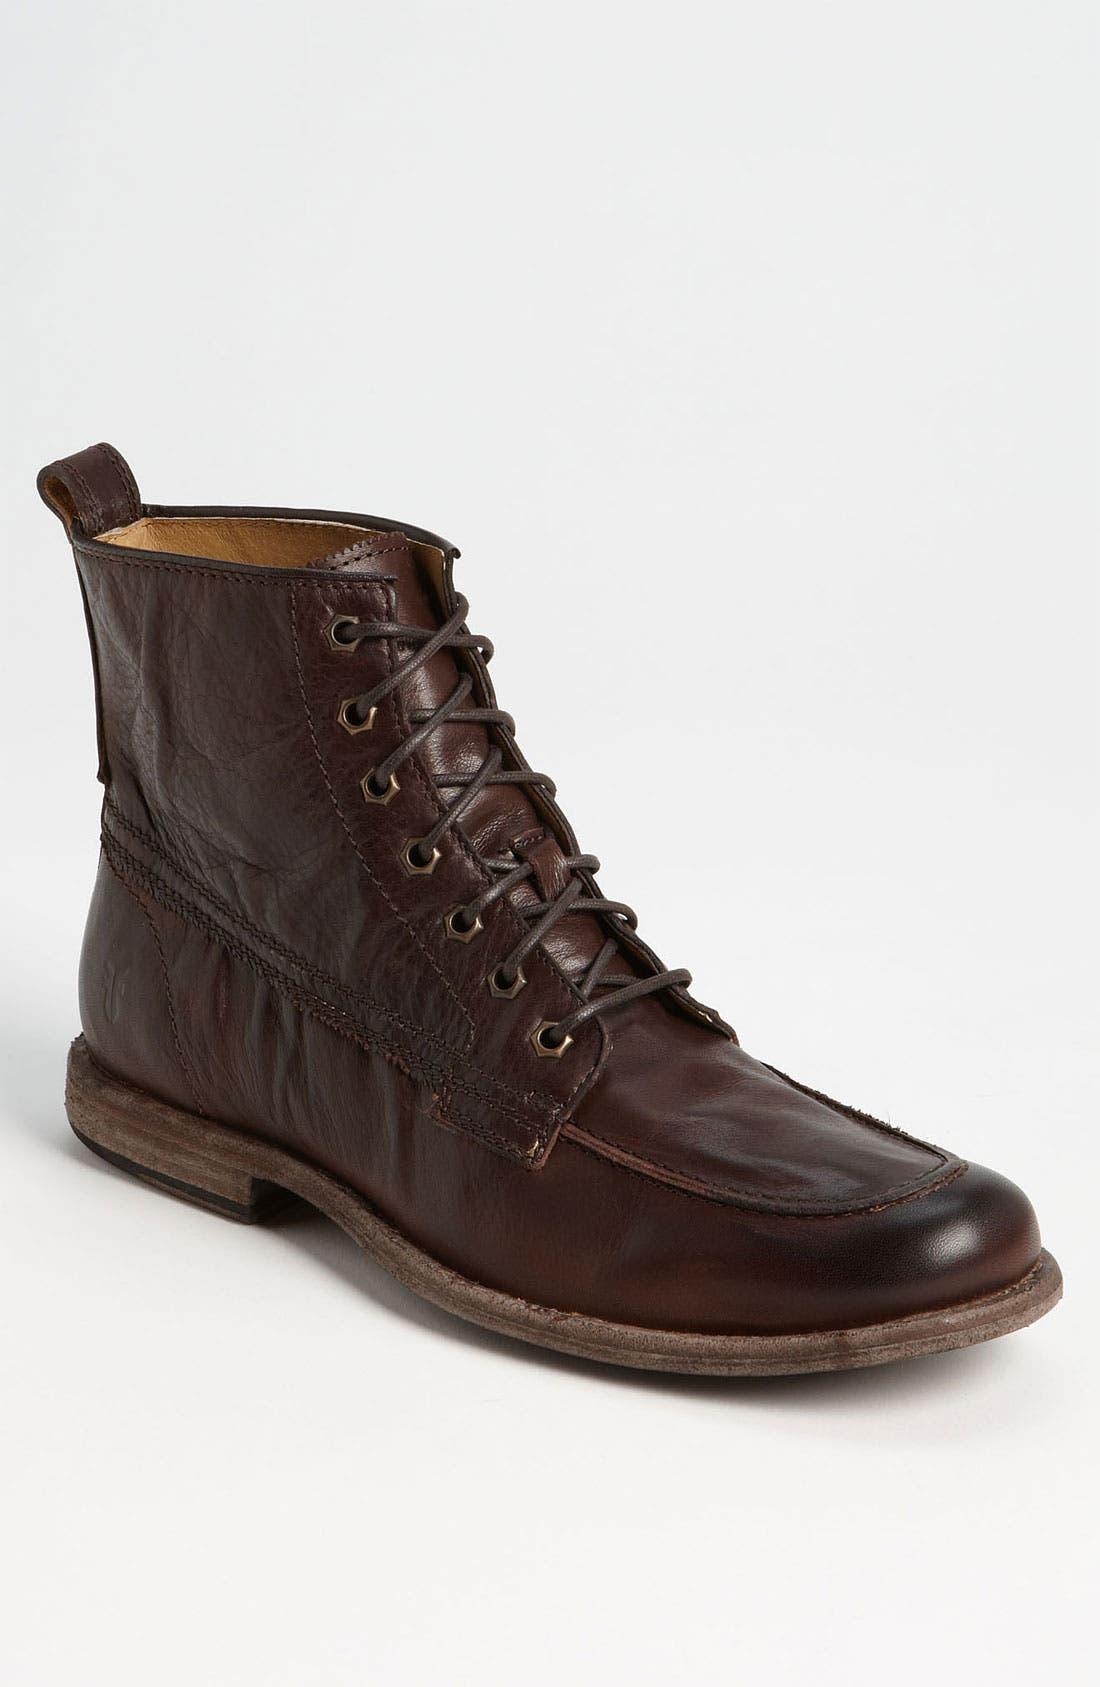 Alternate Image 1 Selected - Frye 'Phillip' Boot